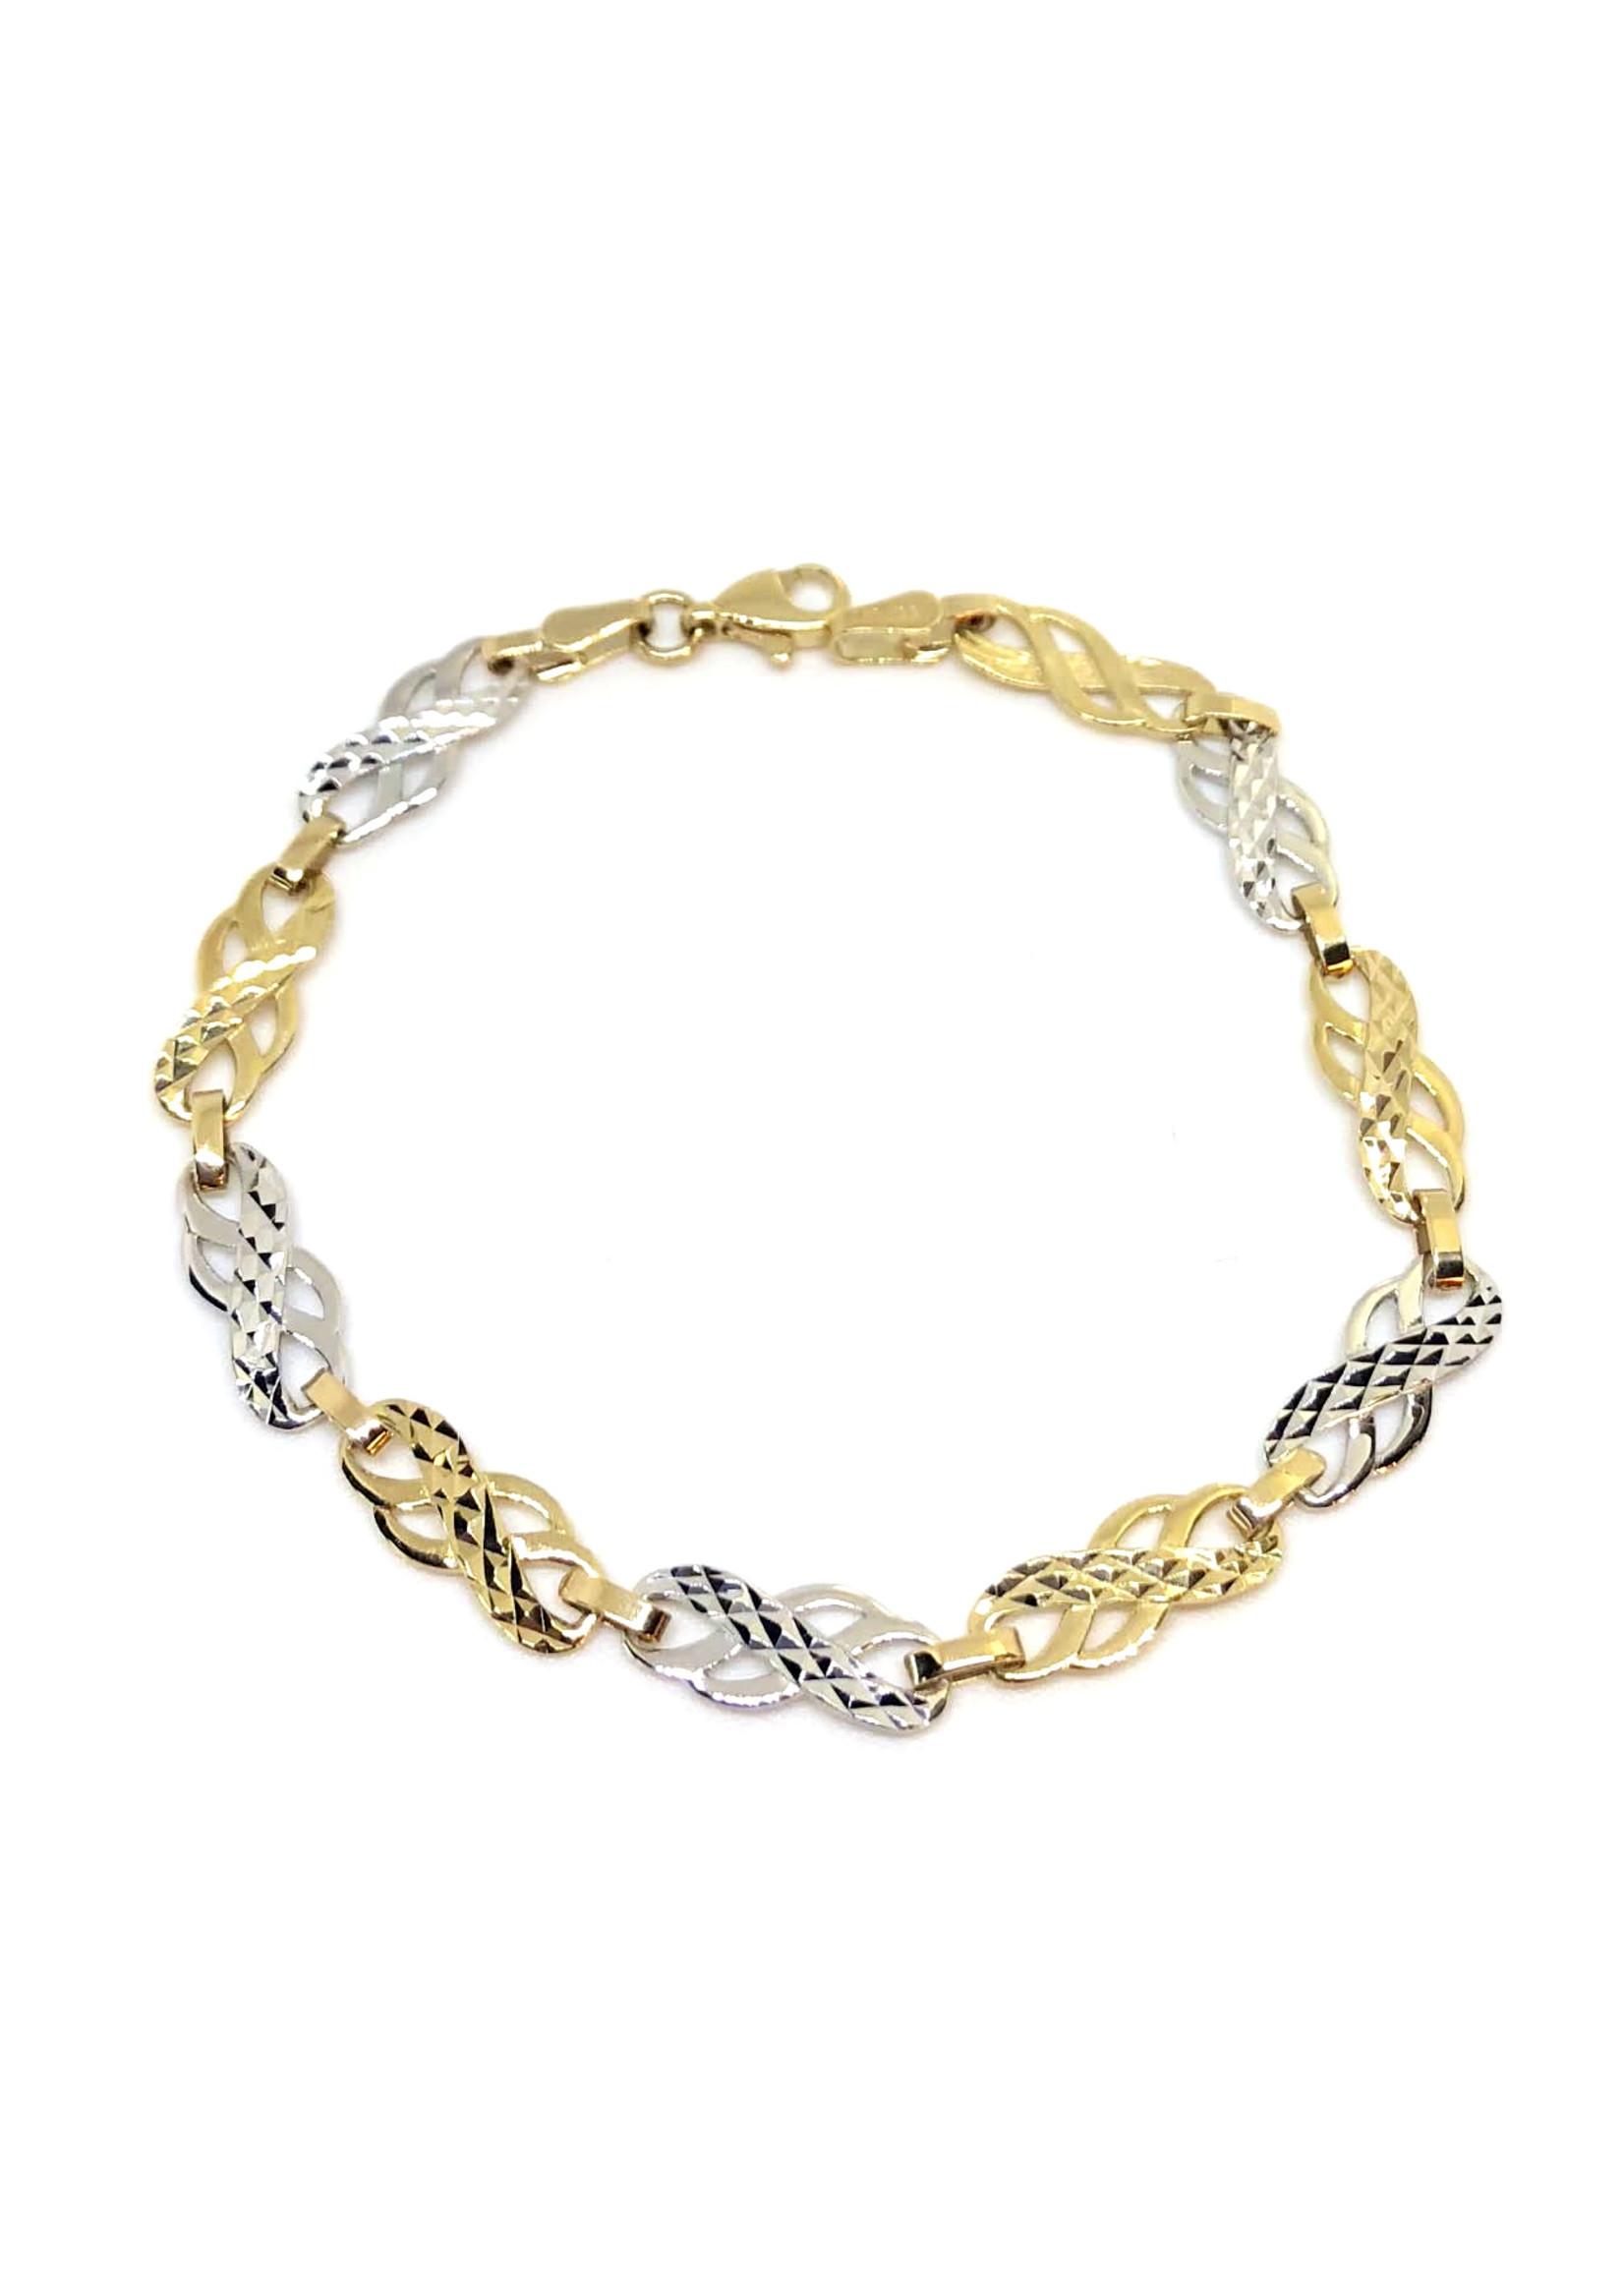 Bracelet Infini Doucle Or 10K 2 tons